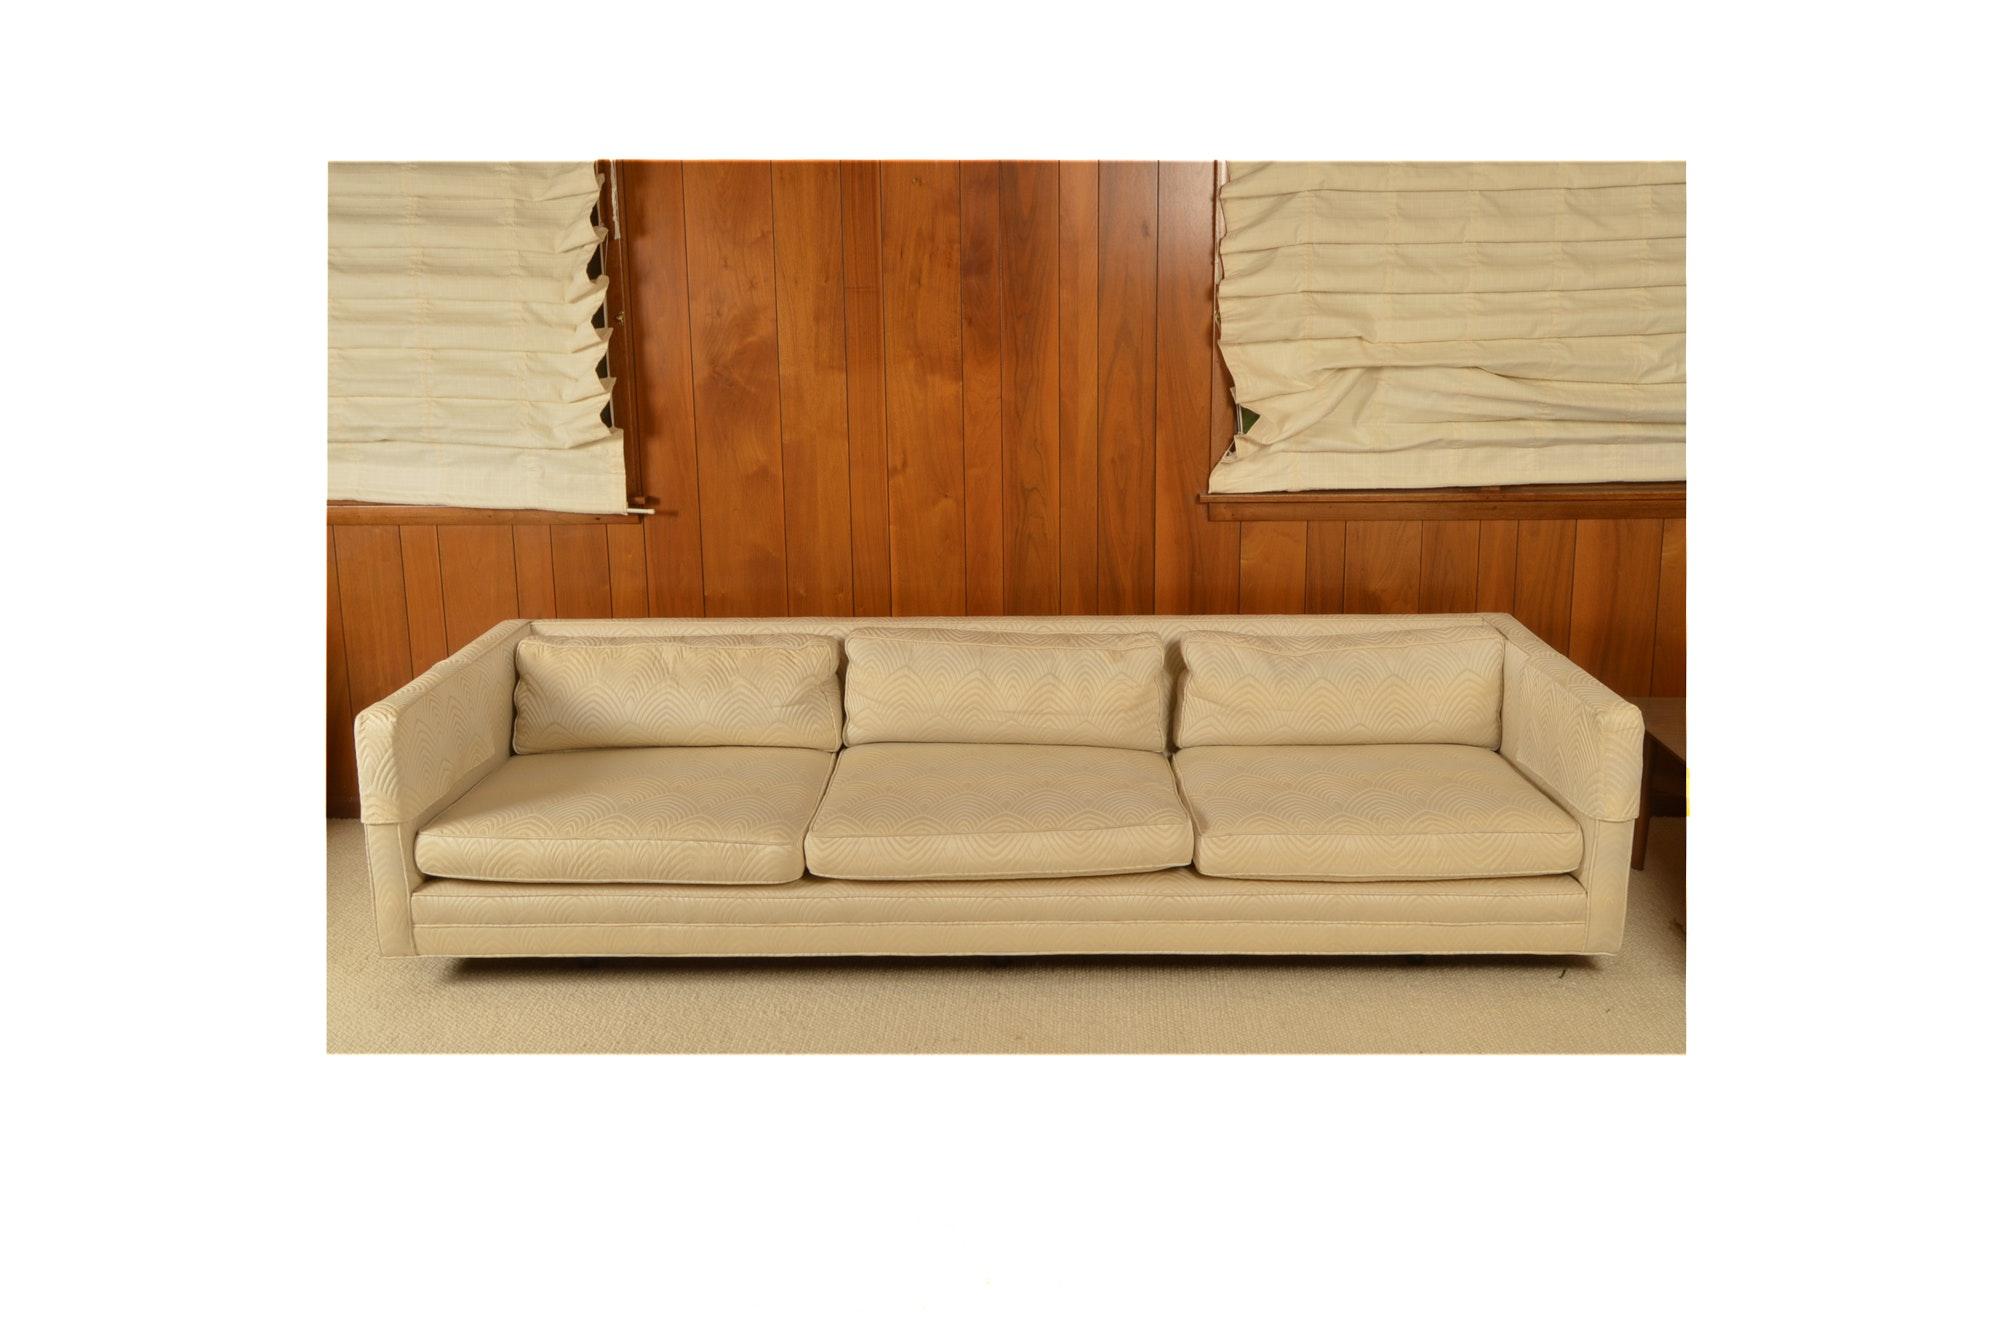 Vintage Voegele Mid Century Sofa